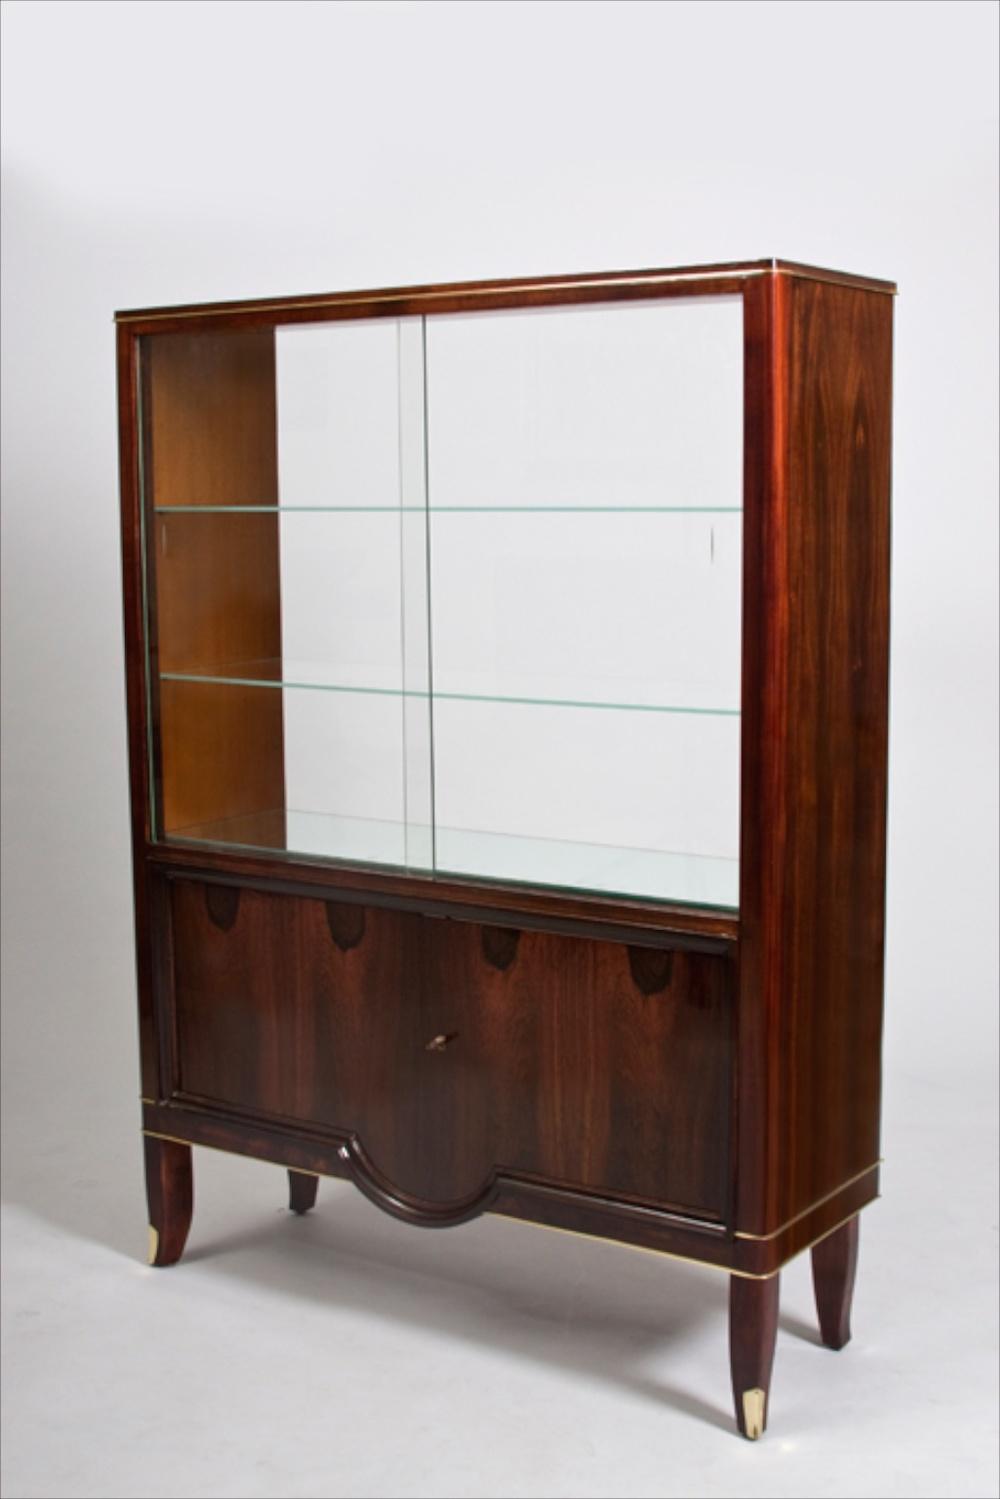 Andre+Arbus+dark+cabinet+708.jpg